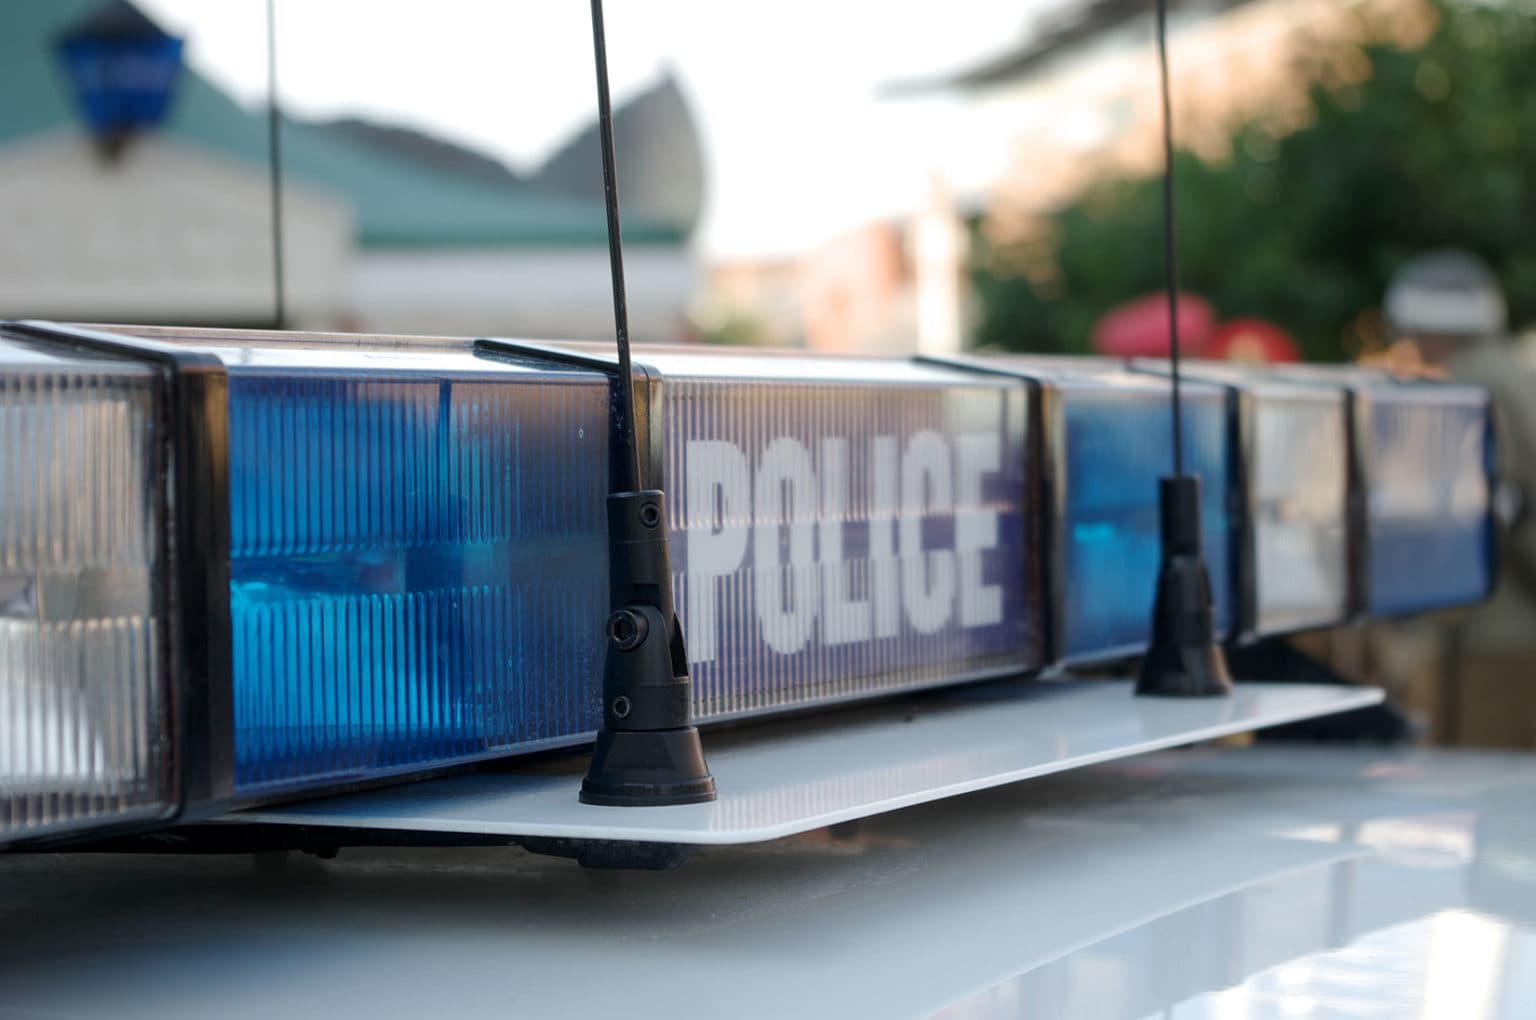 police lights for crime stories